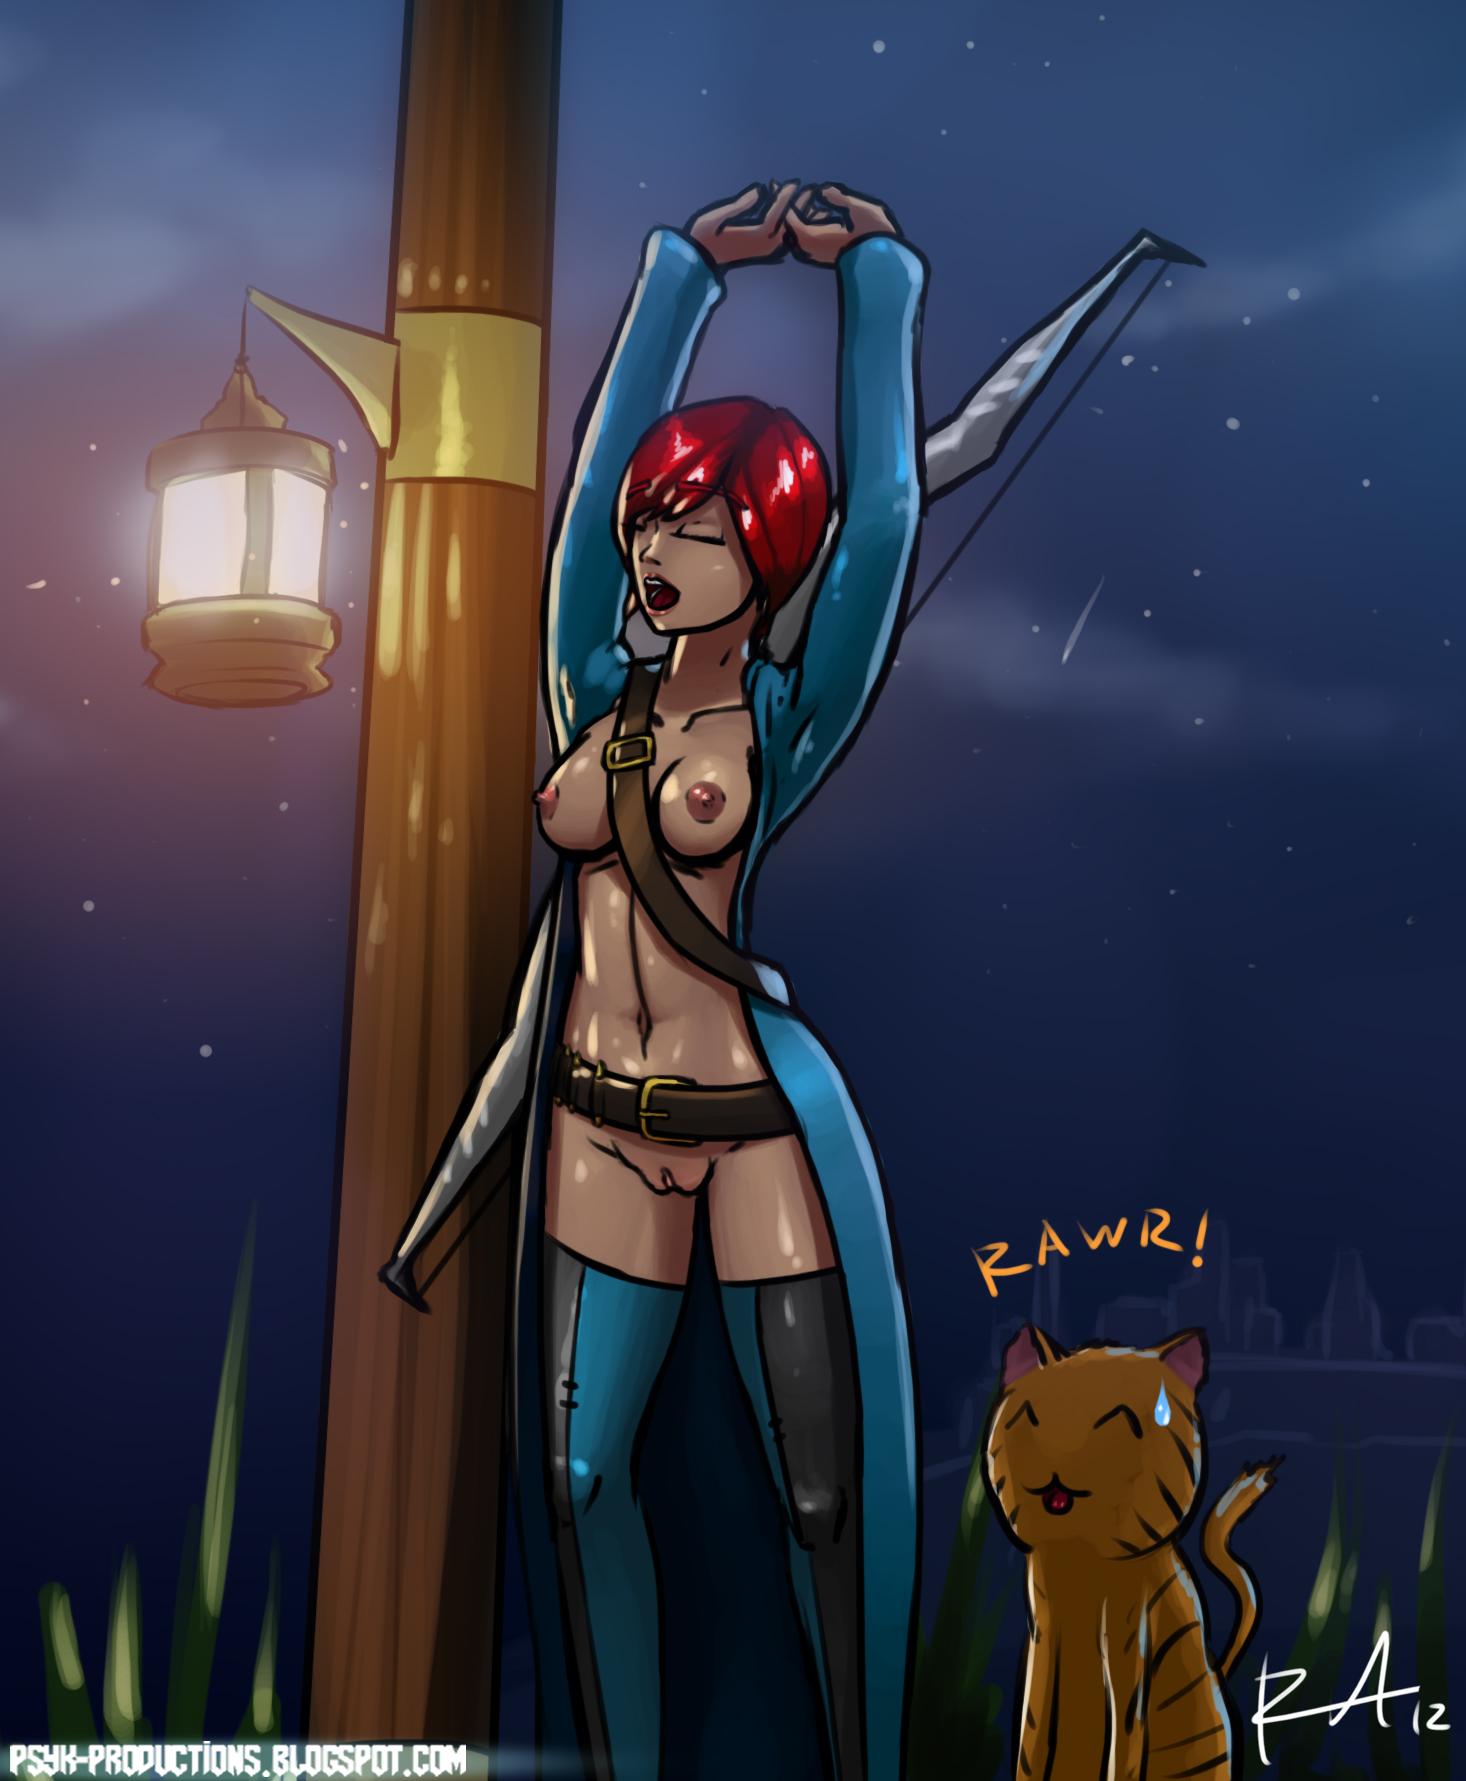 Zinnyah, my GW2 character